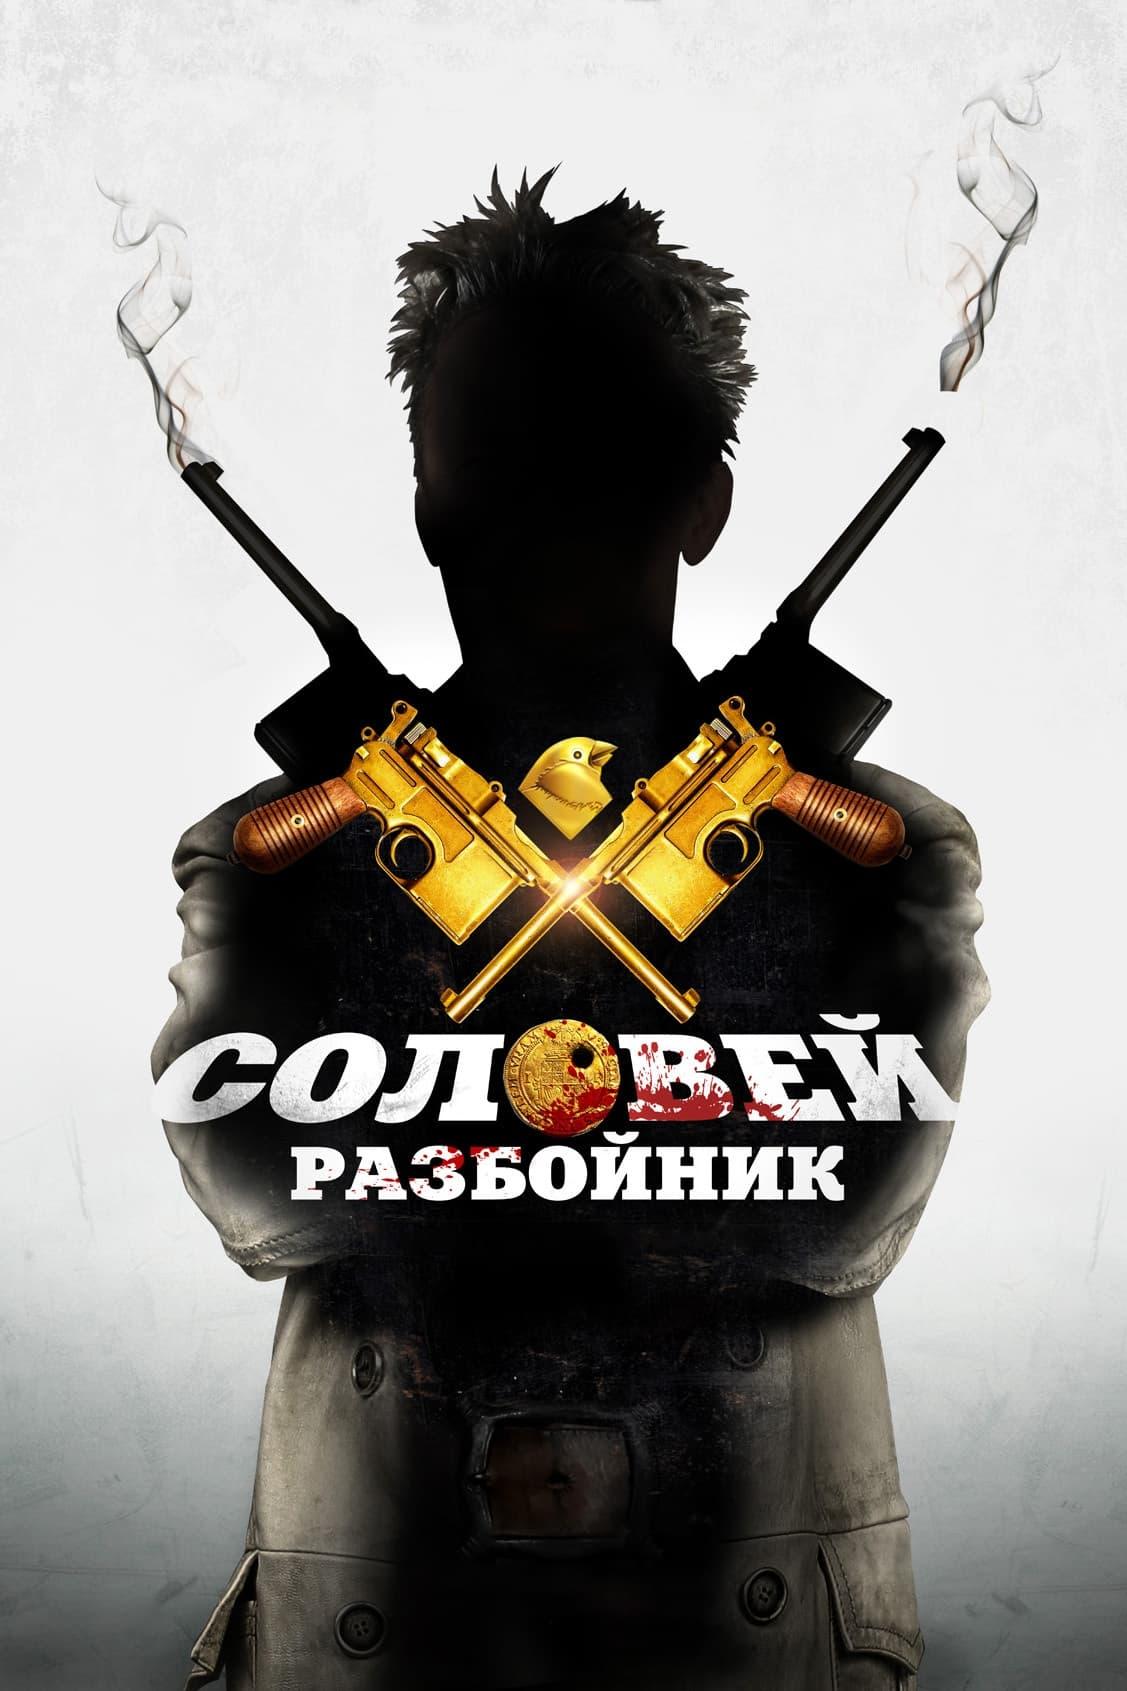 Solovey-Razboynik